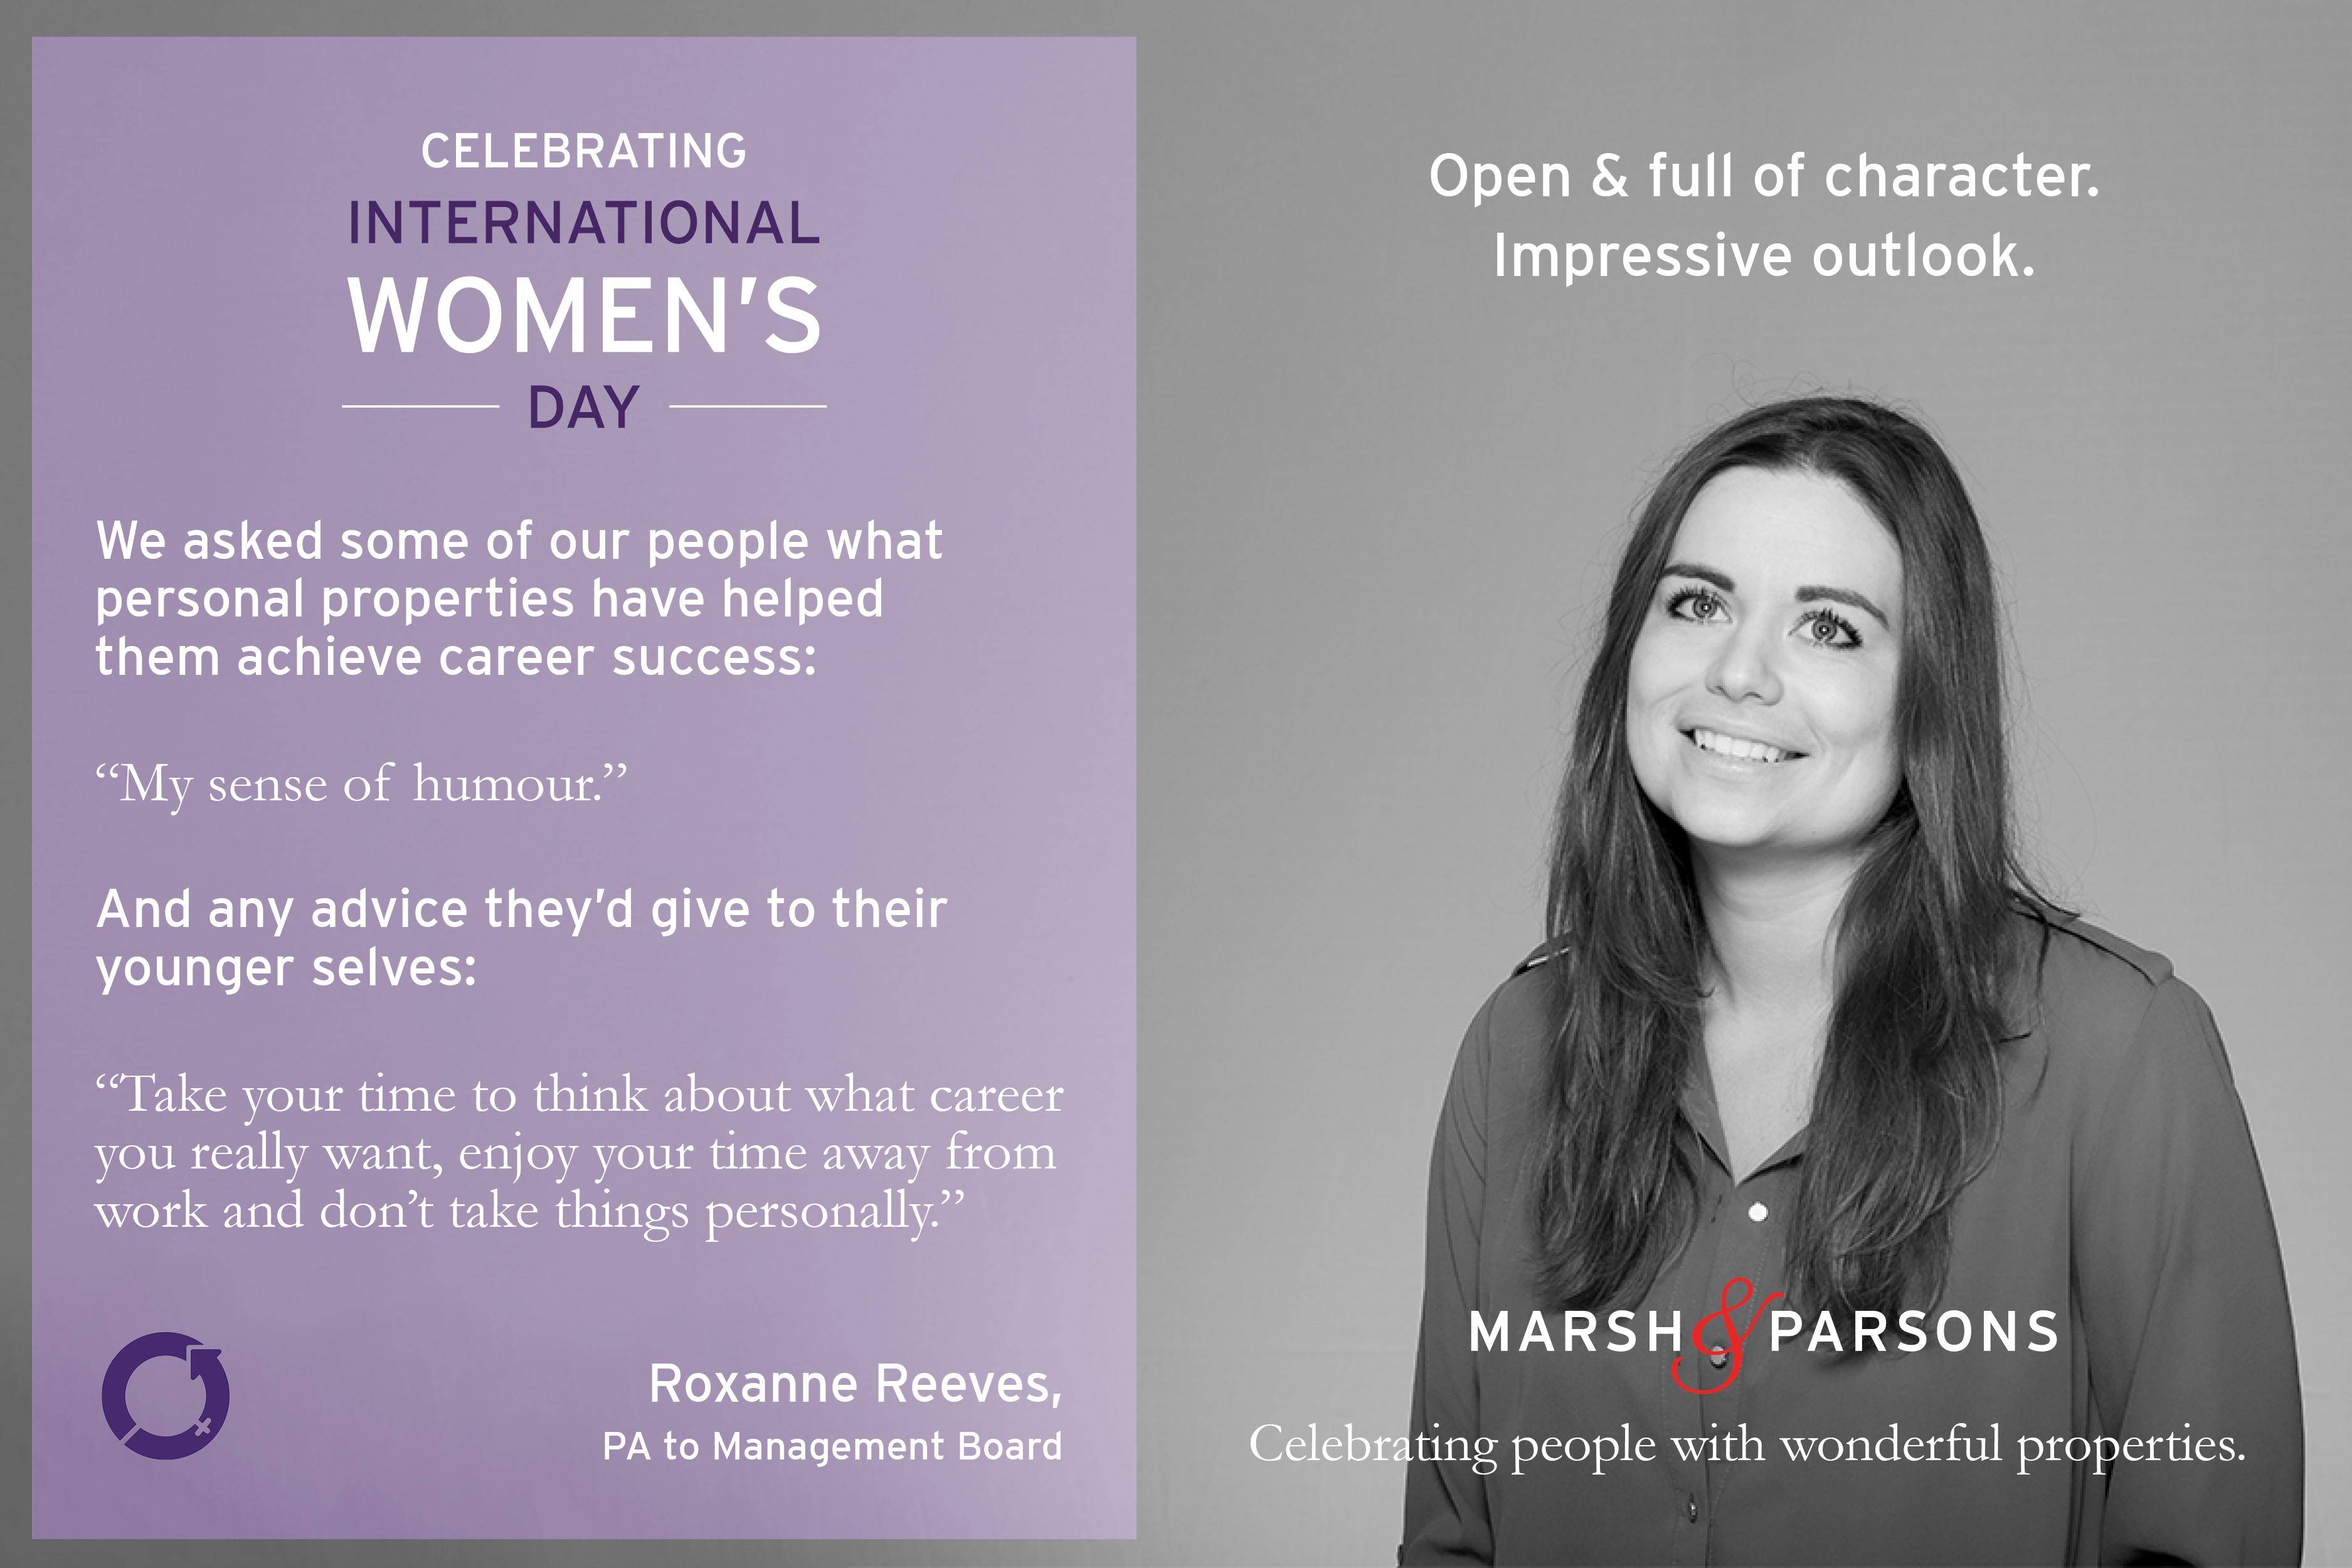 Roxanne Reeves, International Women's Day